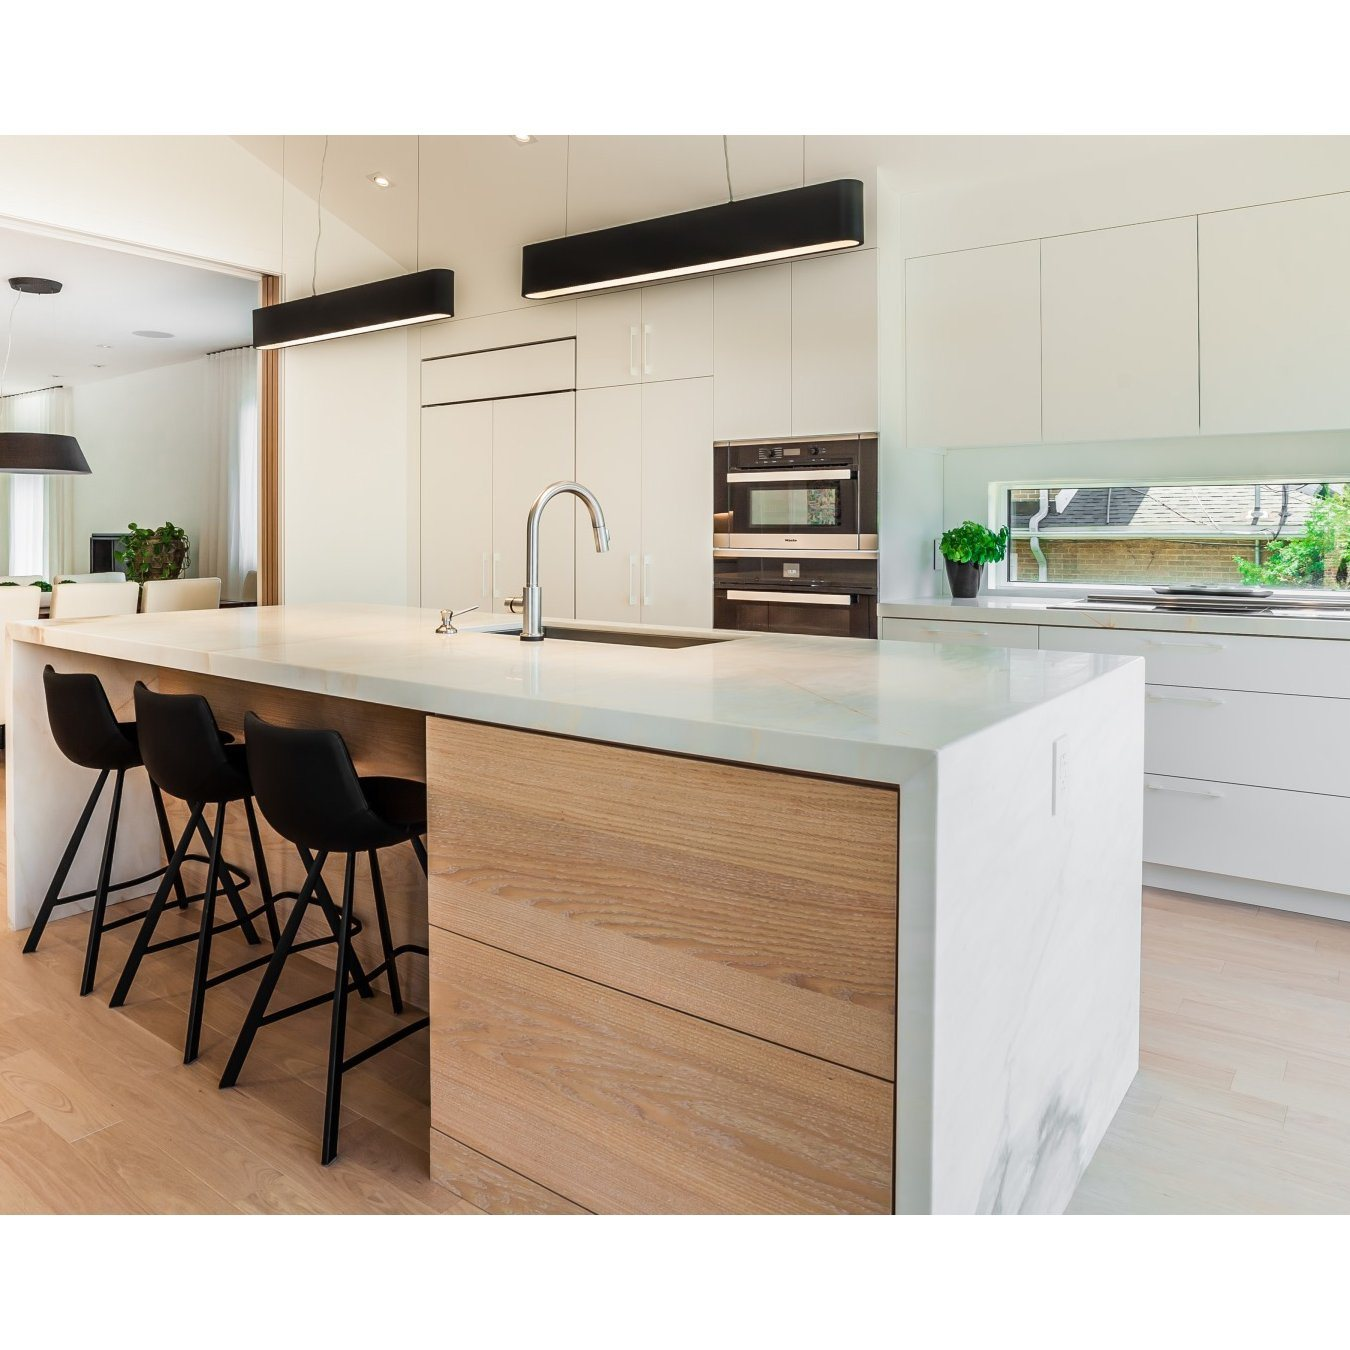 [Hot Item] China Manufacturer Outlet Modular Flat Pack Bespoke Kitchen  Cabinet